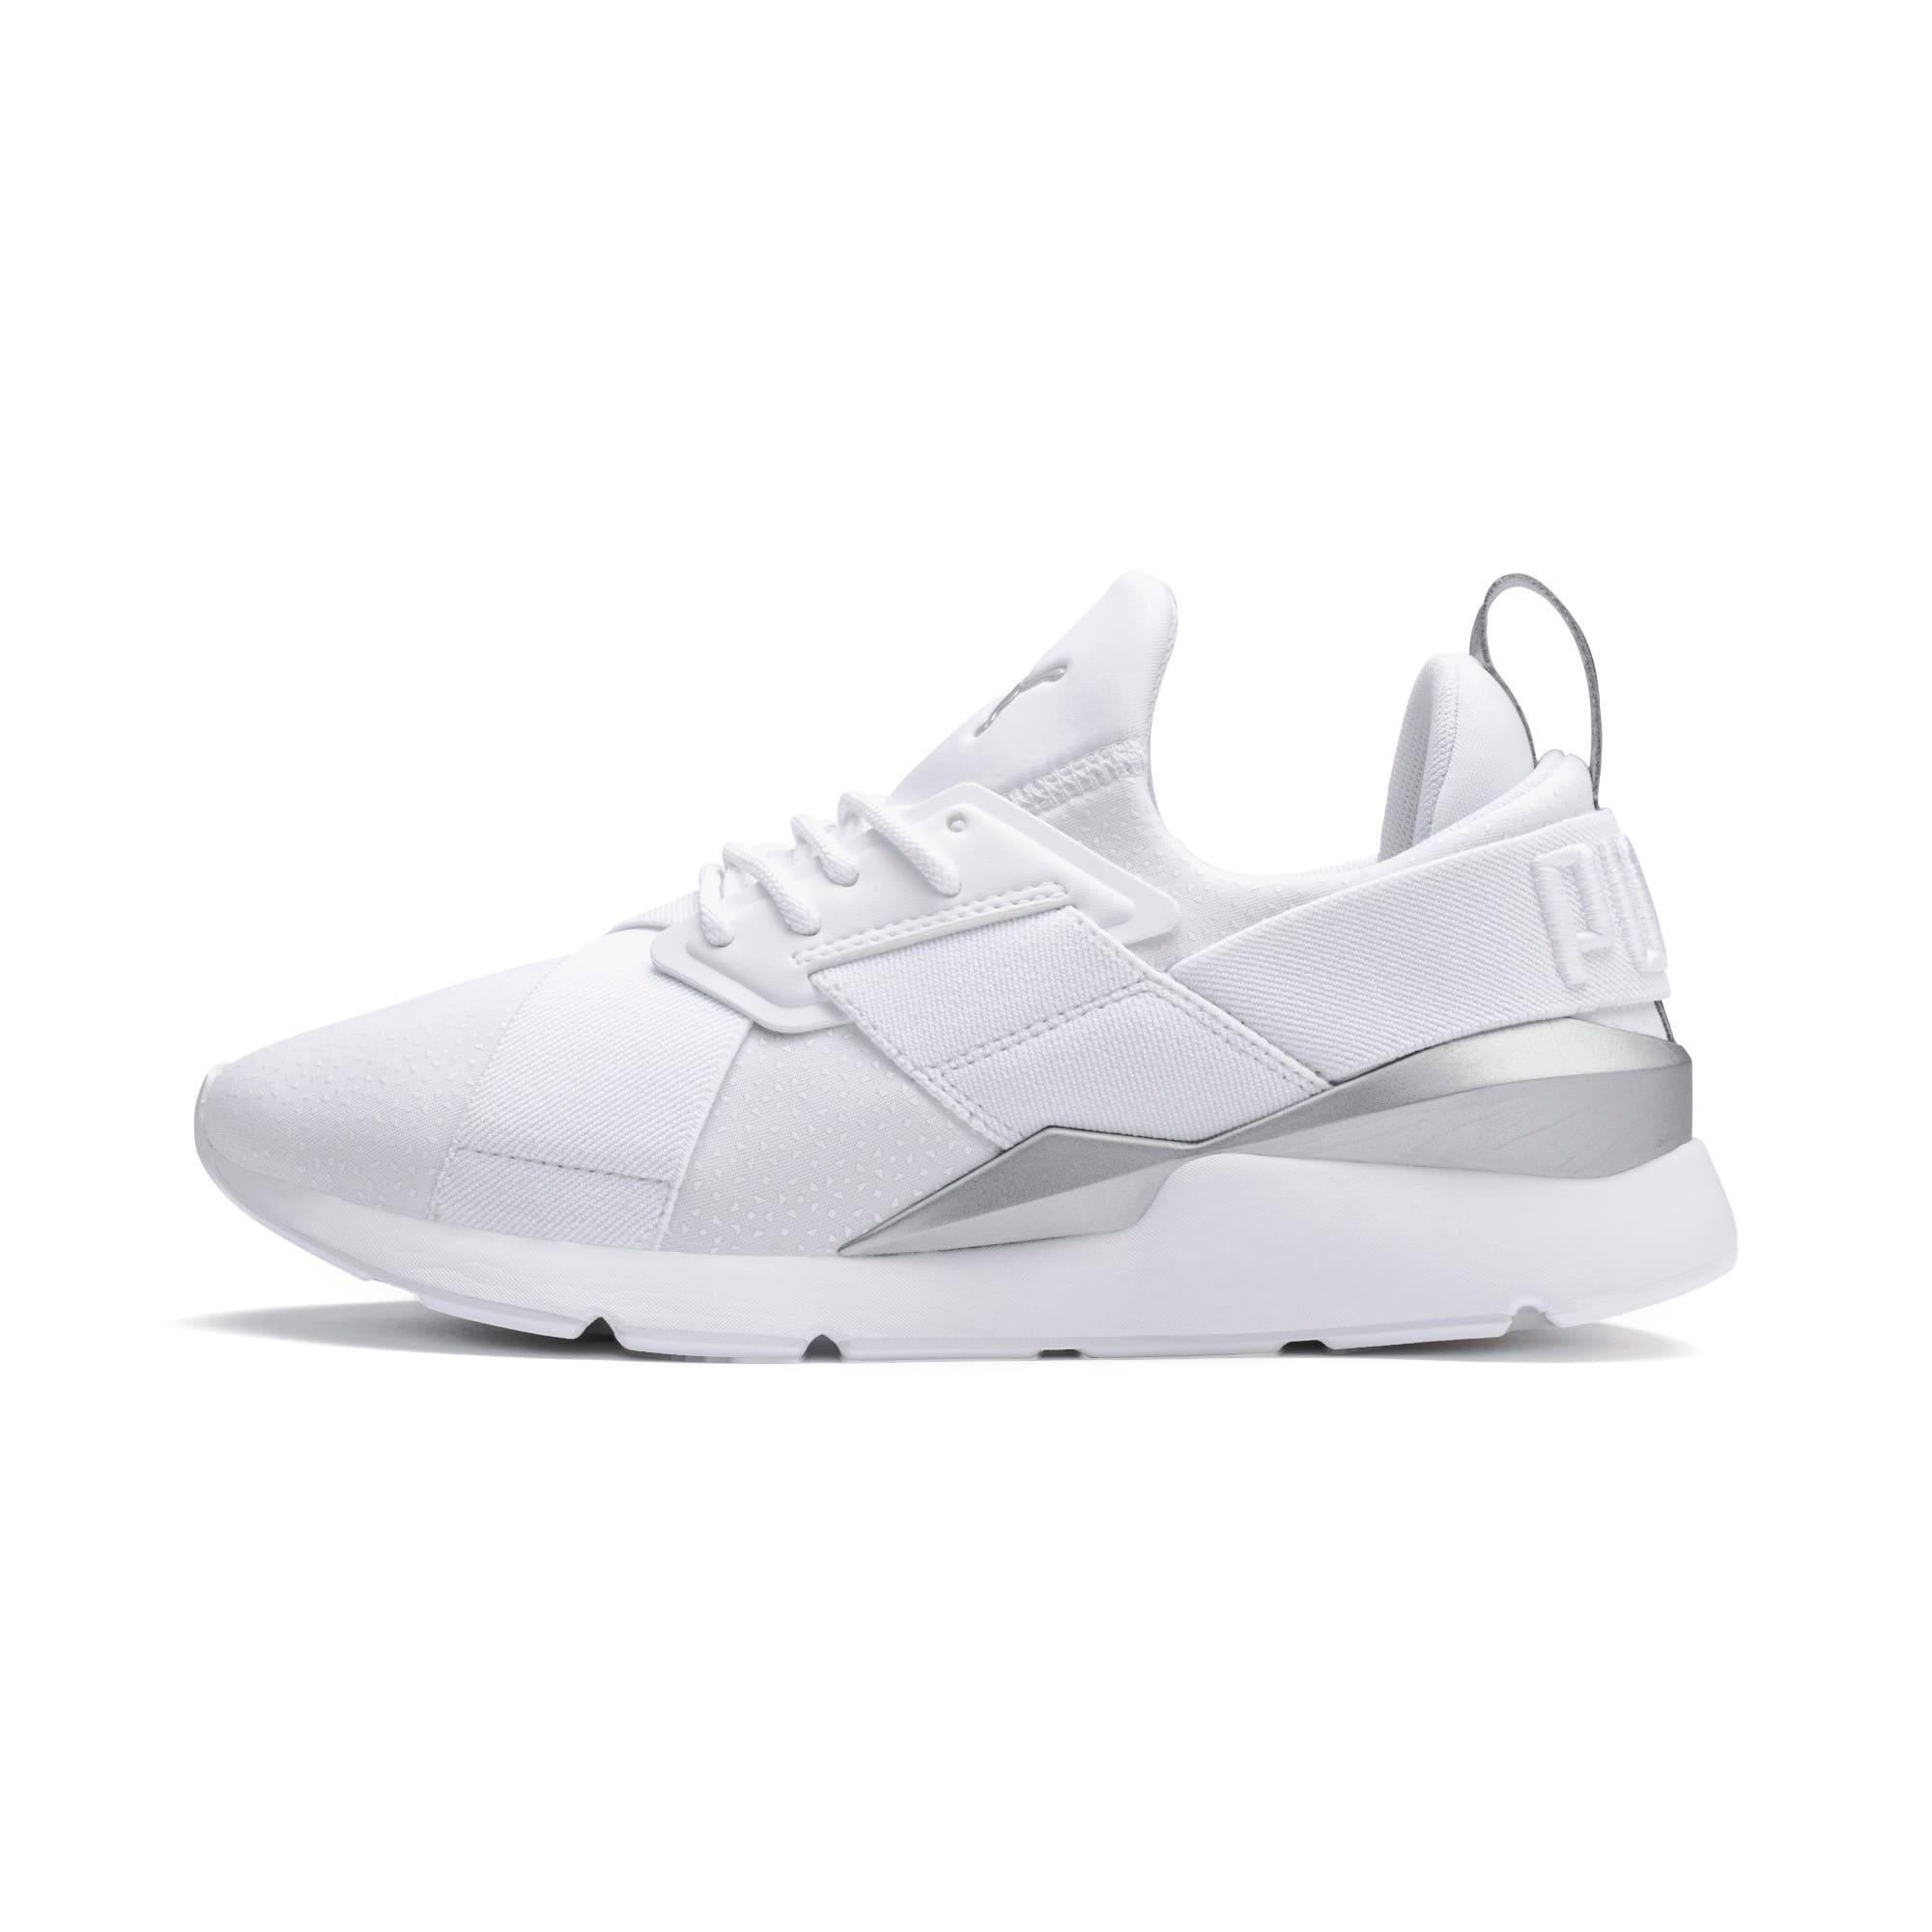 Thumbnail 1 of Muse Perf Women's Sneakers, Puma White-Puma Silver, medium